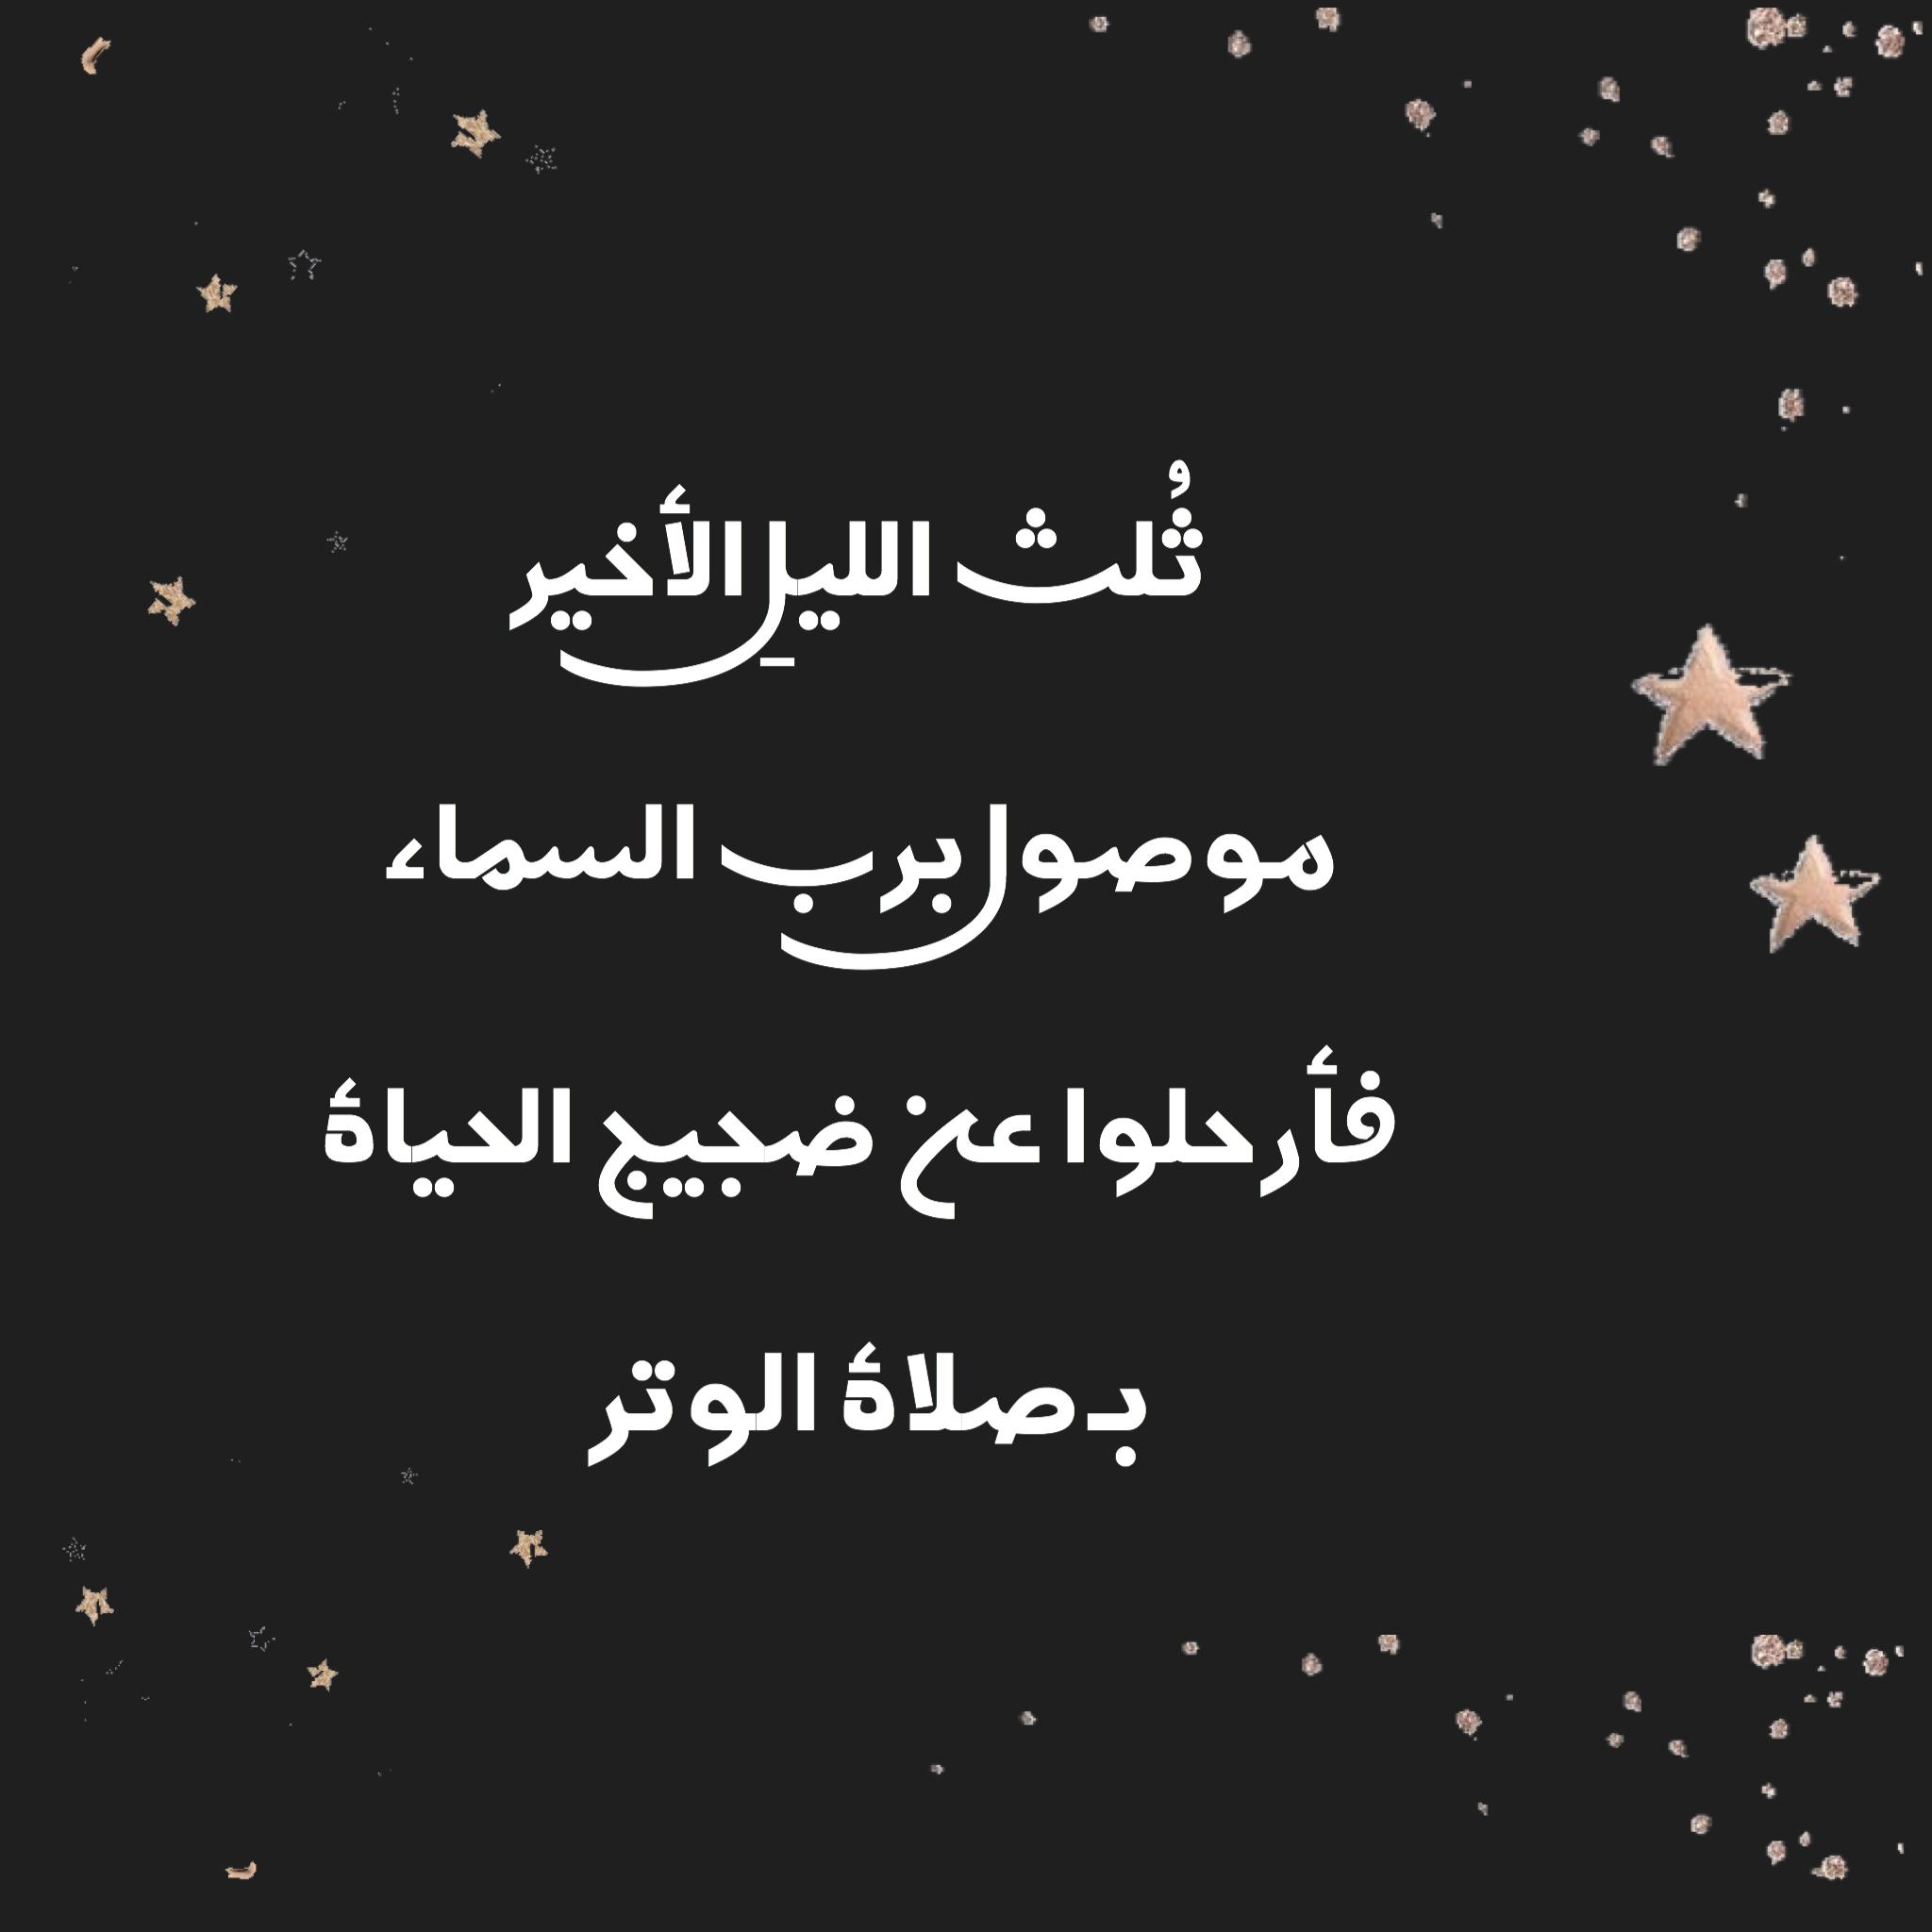 Pin By Laili On أثر Arabic Calligraphy Calligraphy